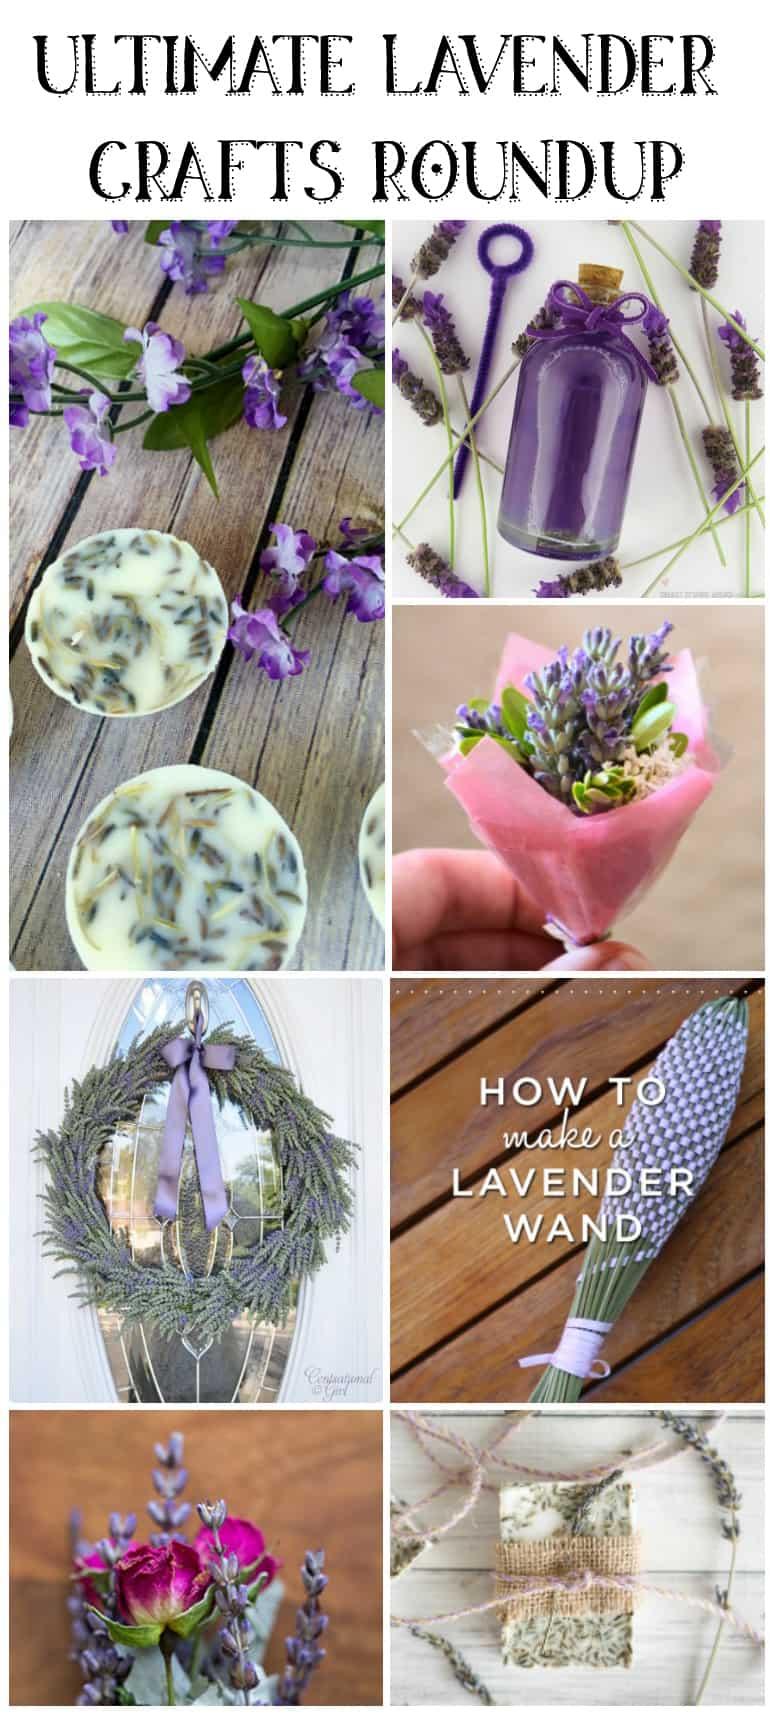 ultimate lavender crafts roundup